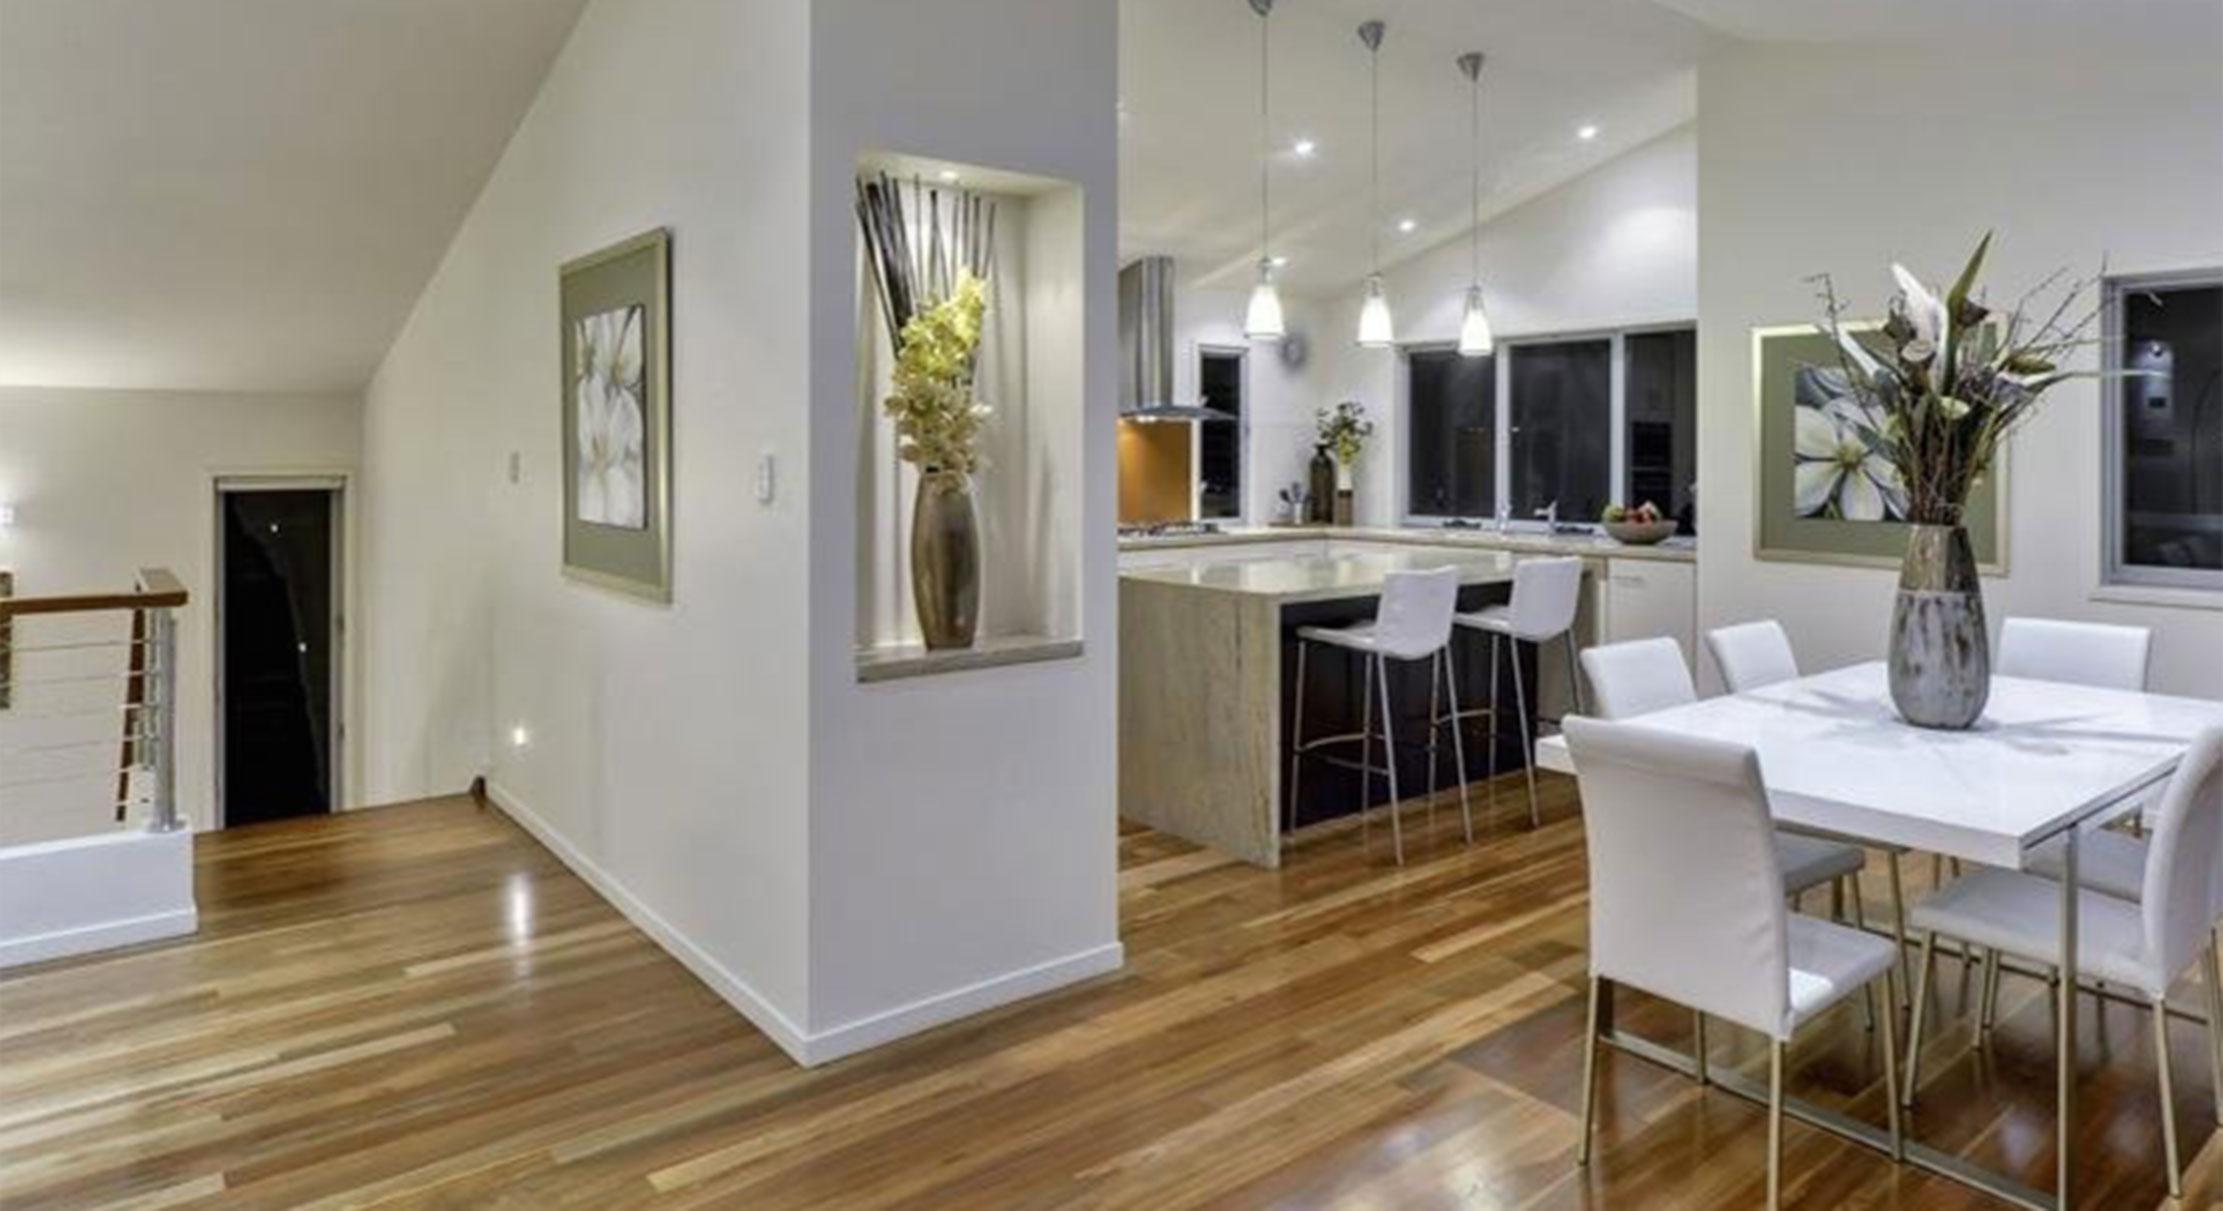 portfolio-2-slider-image-7-kitchen-newmarket-gary-cramb-constructions-brisbane